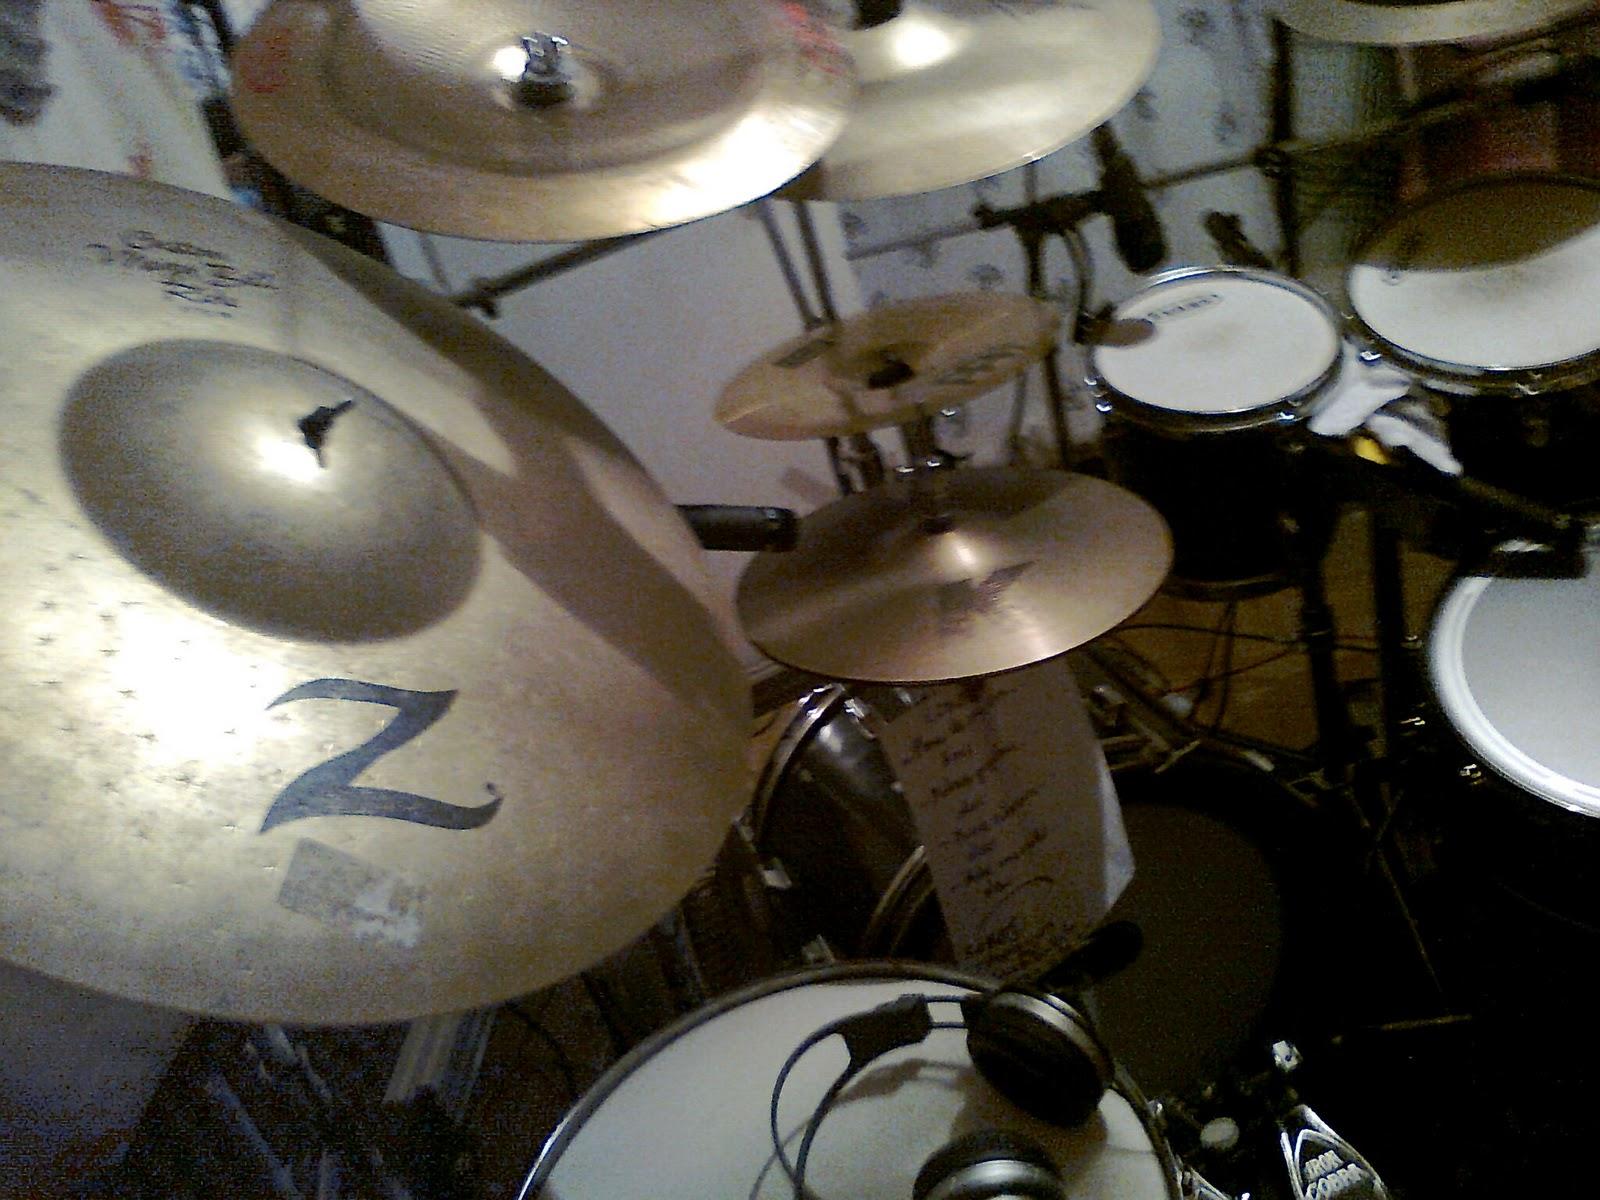 Dimensiones Del Vacio Drum Kit